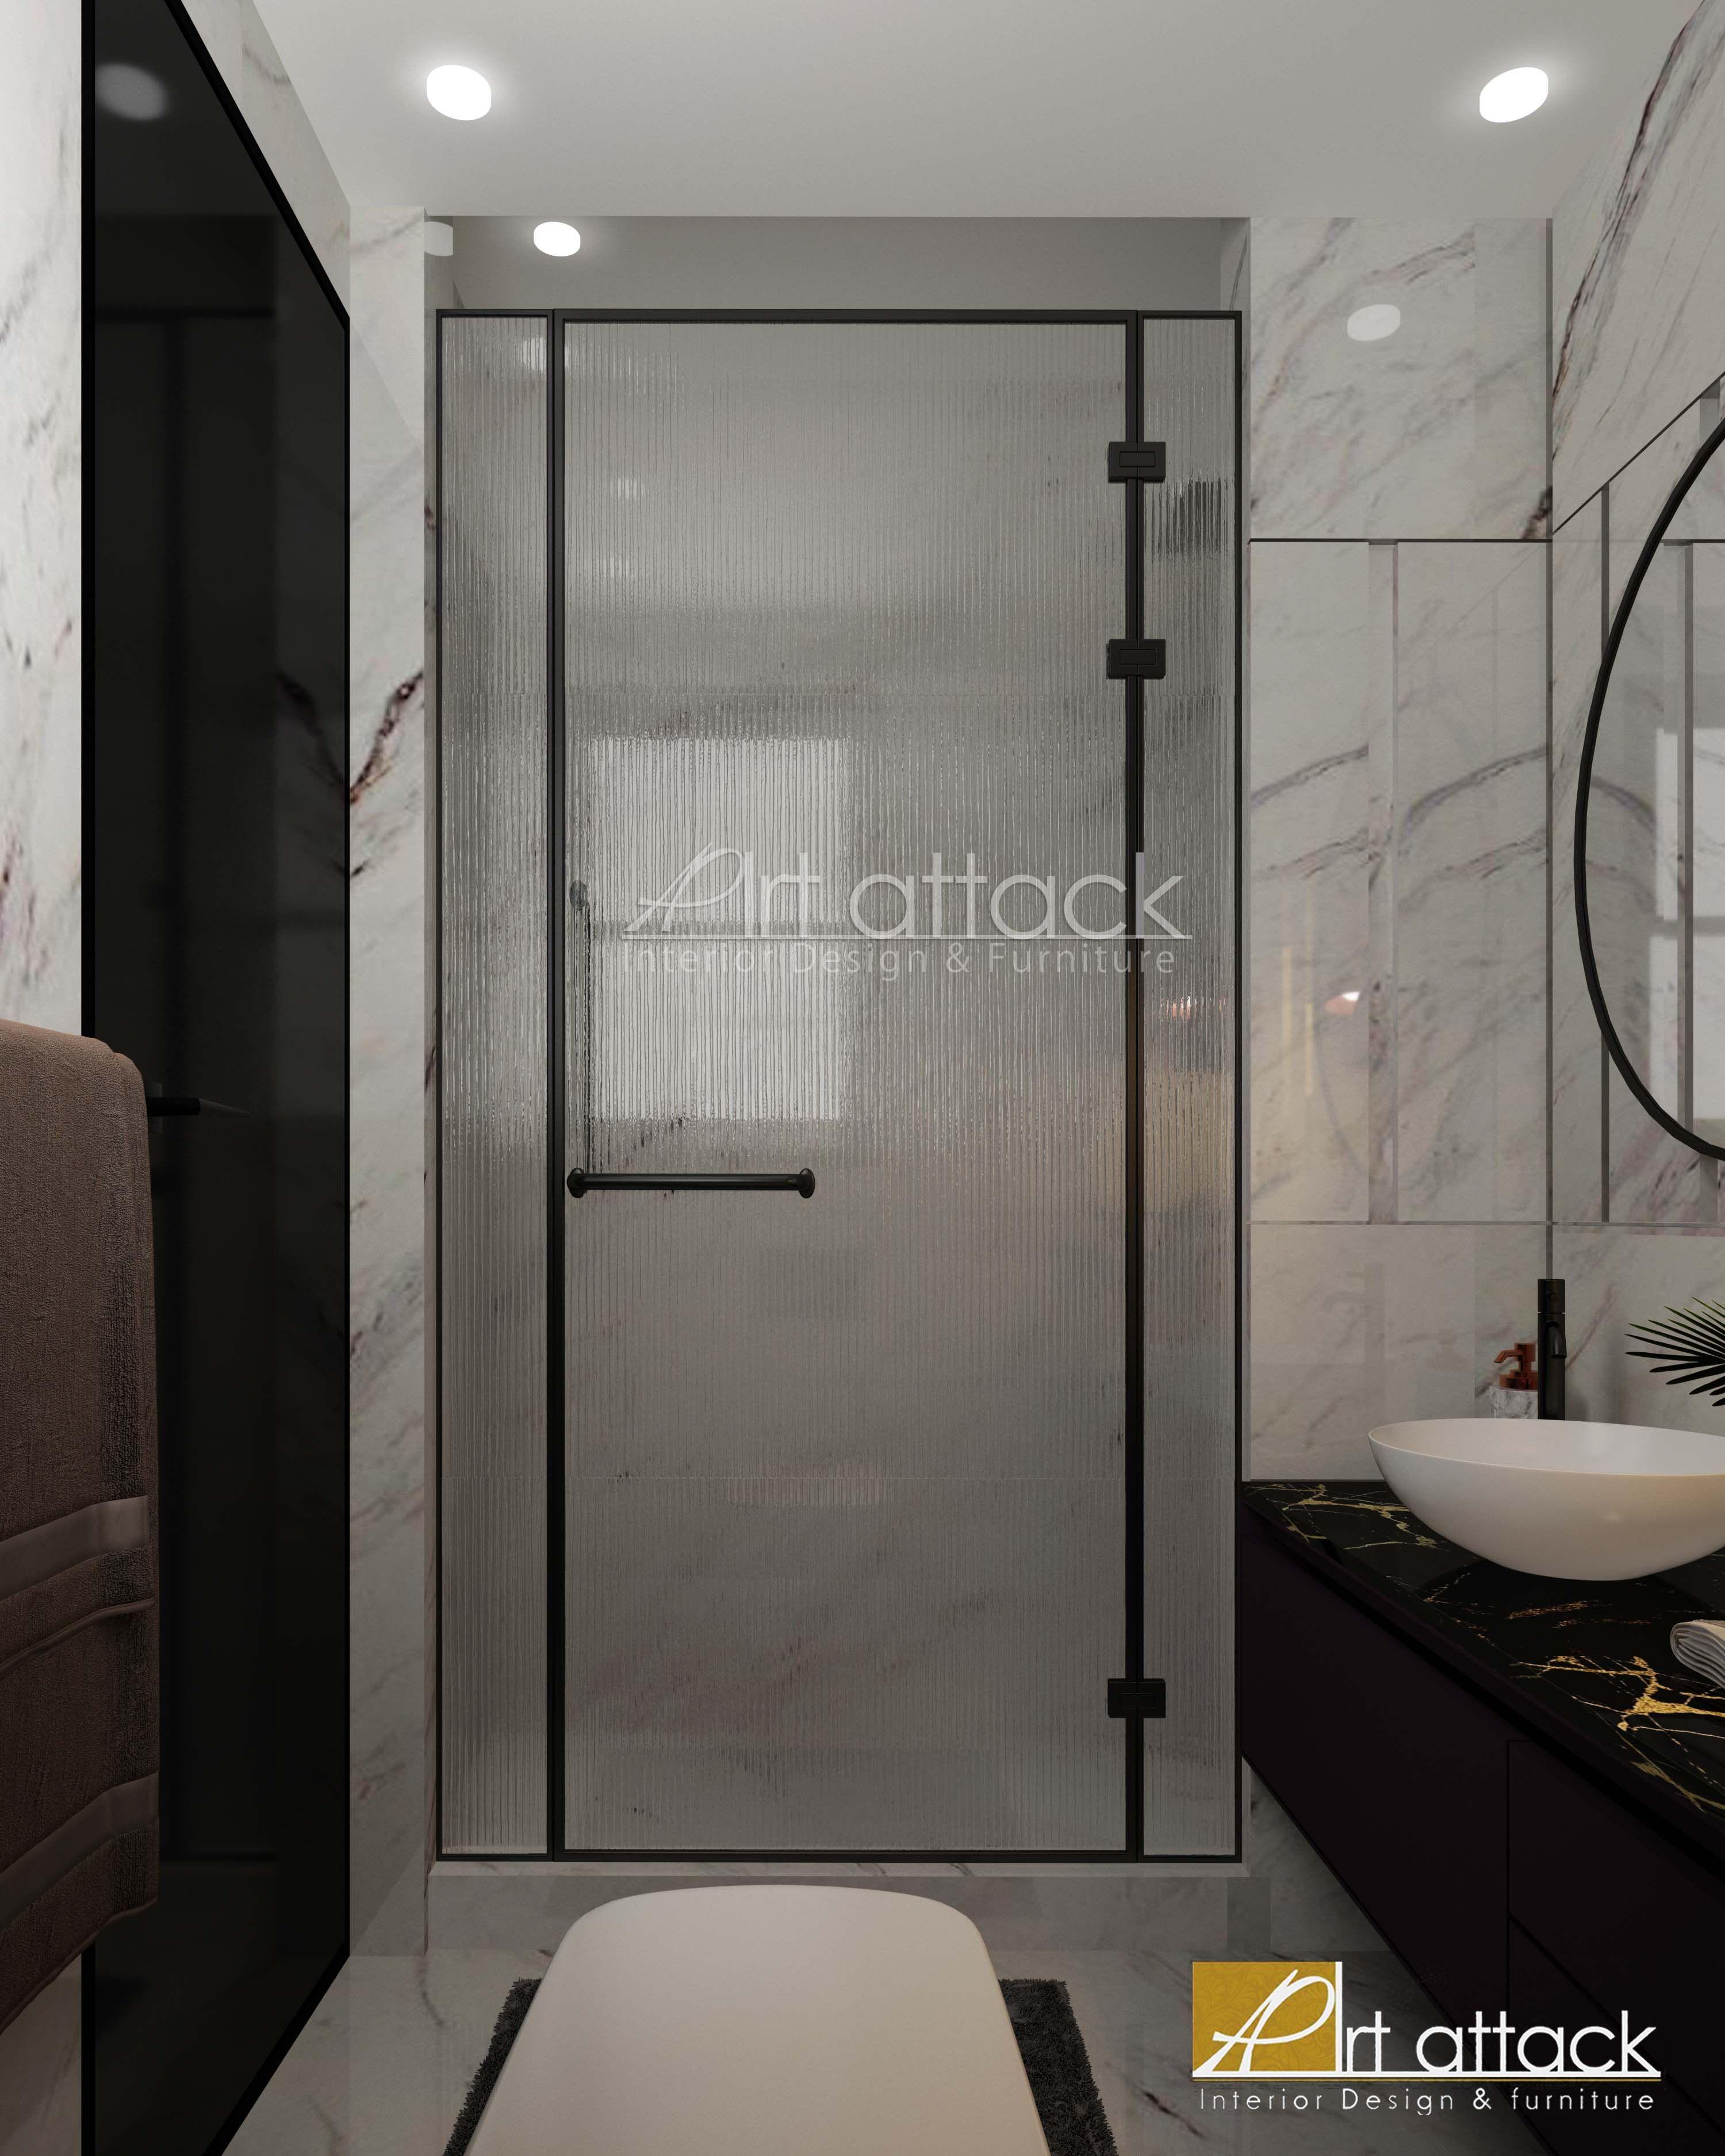 Interior Design Design Art Attack My Room شقق عيادة فيلا الرحاب مودرن تصميم تصميم داخلي Apartment Decoration Decor Bathroom Mirror Selfie Bathtub